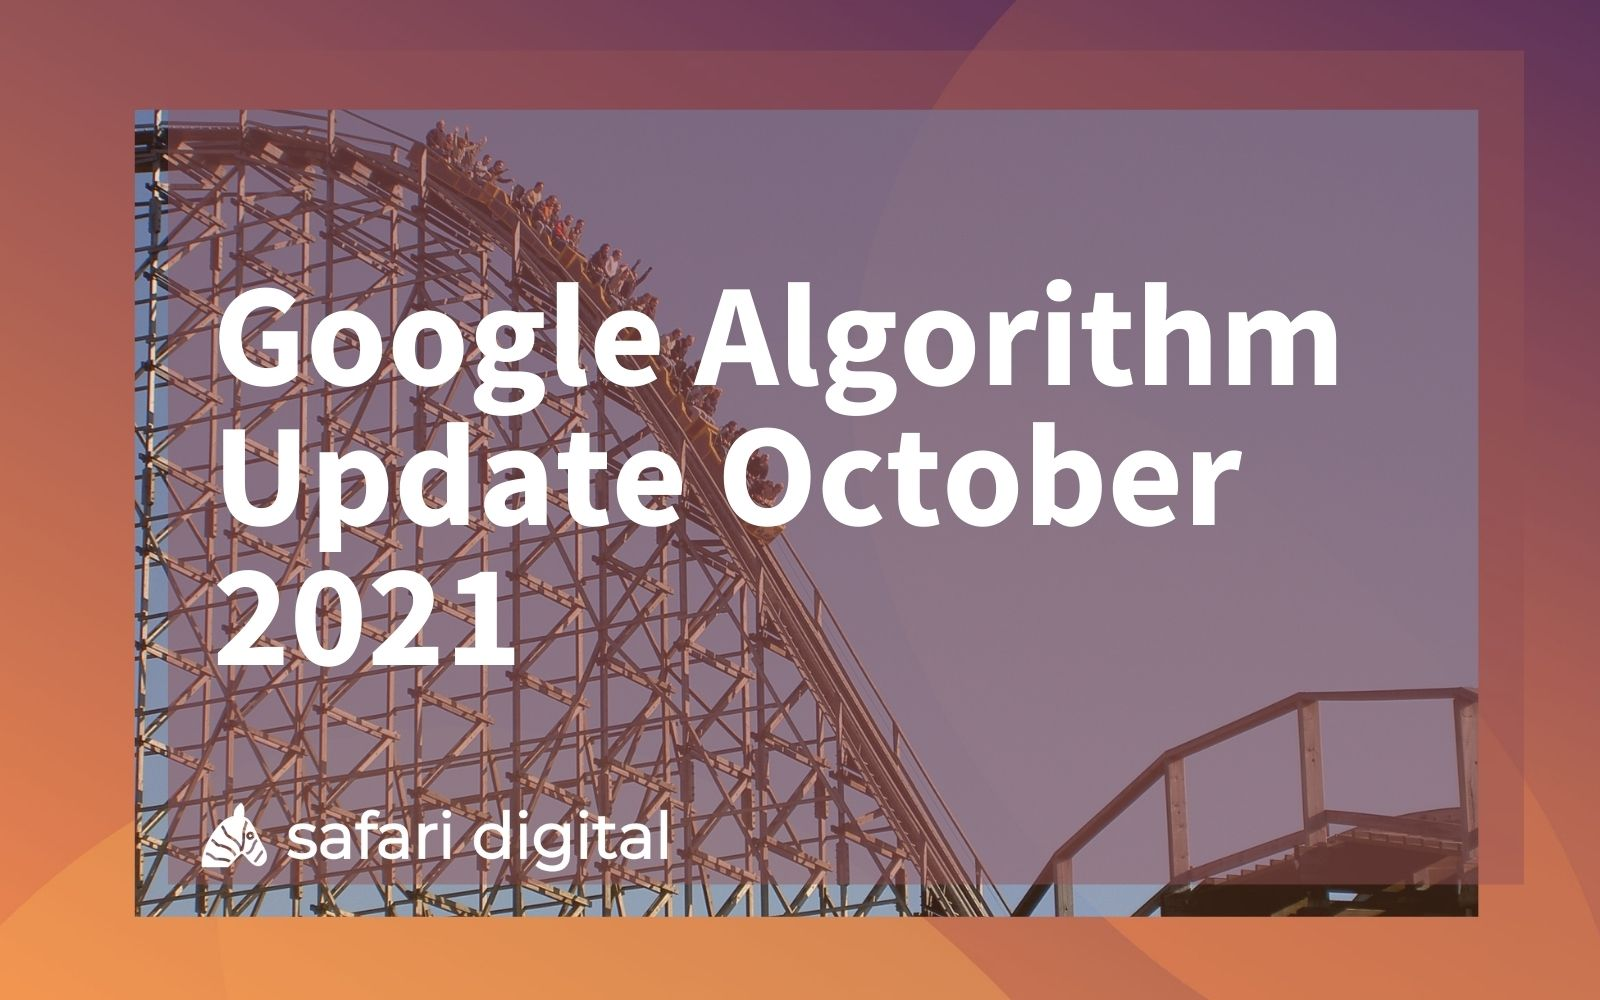 Google Algorithm Update October 2021